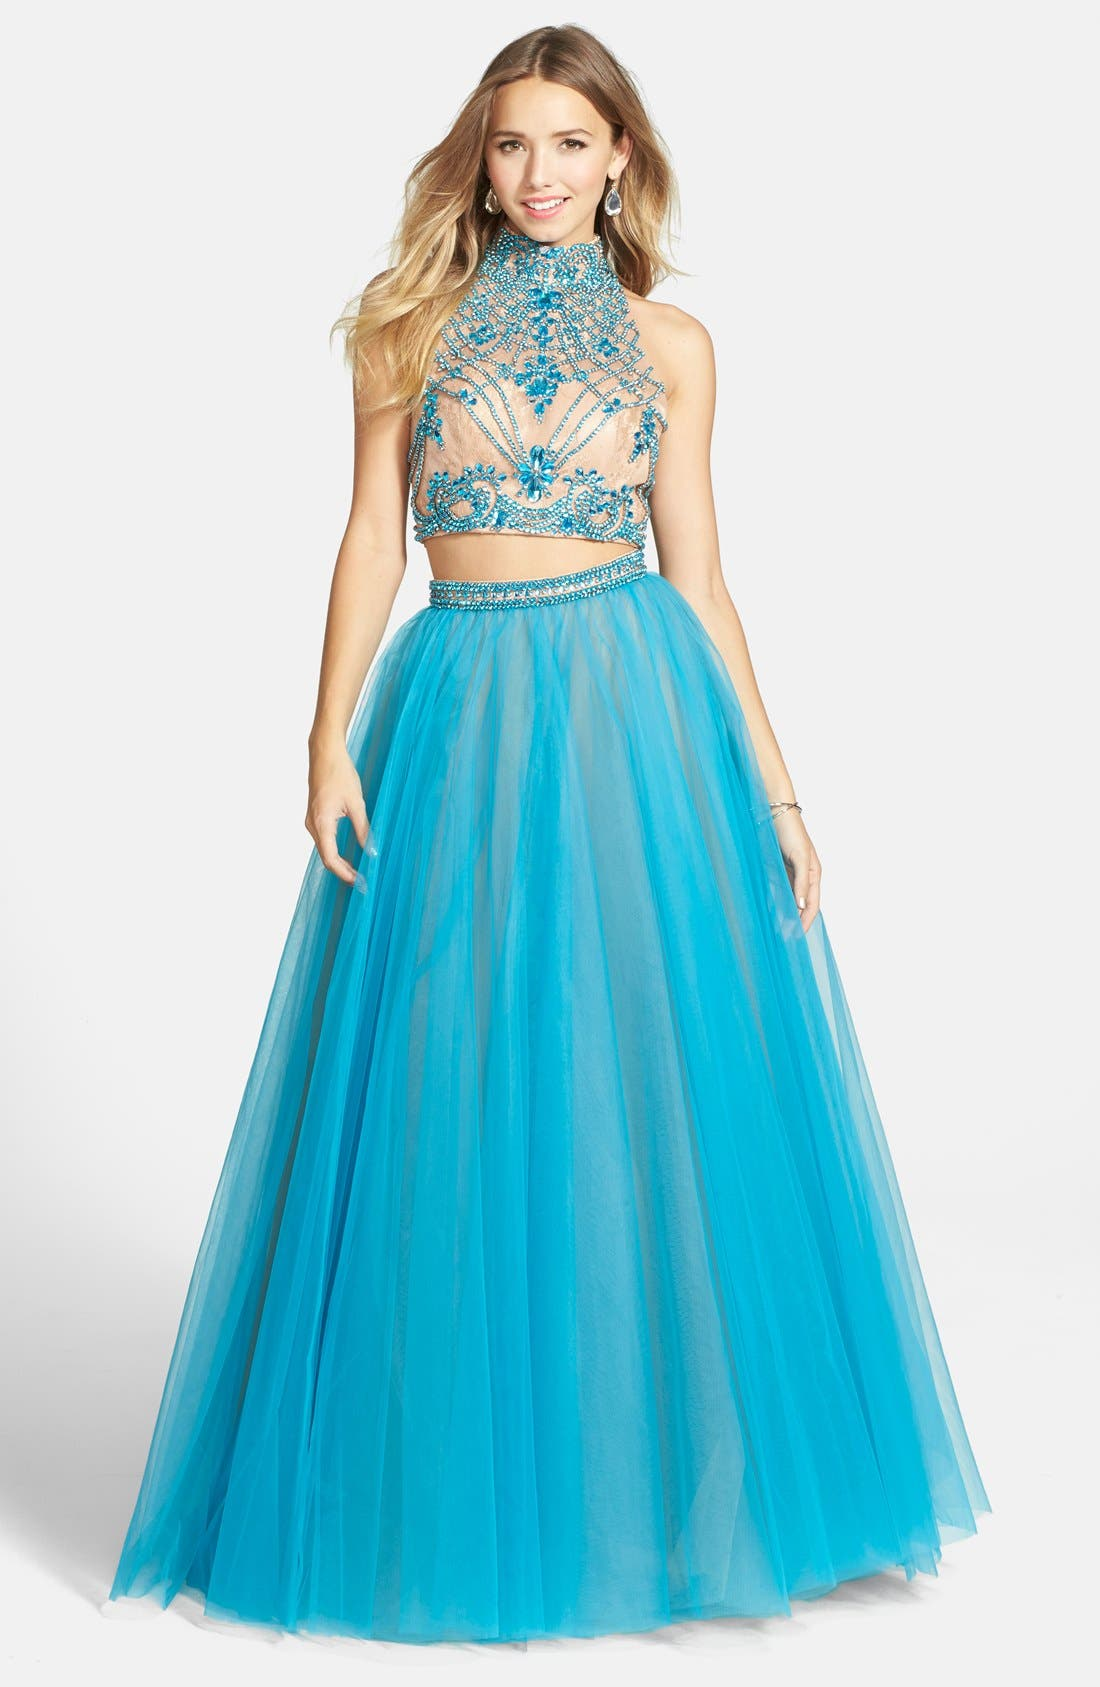 Main Image - Sherri Hill Embellished Lace Crop Halter Tank & Chiffon Skirt